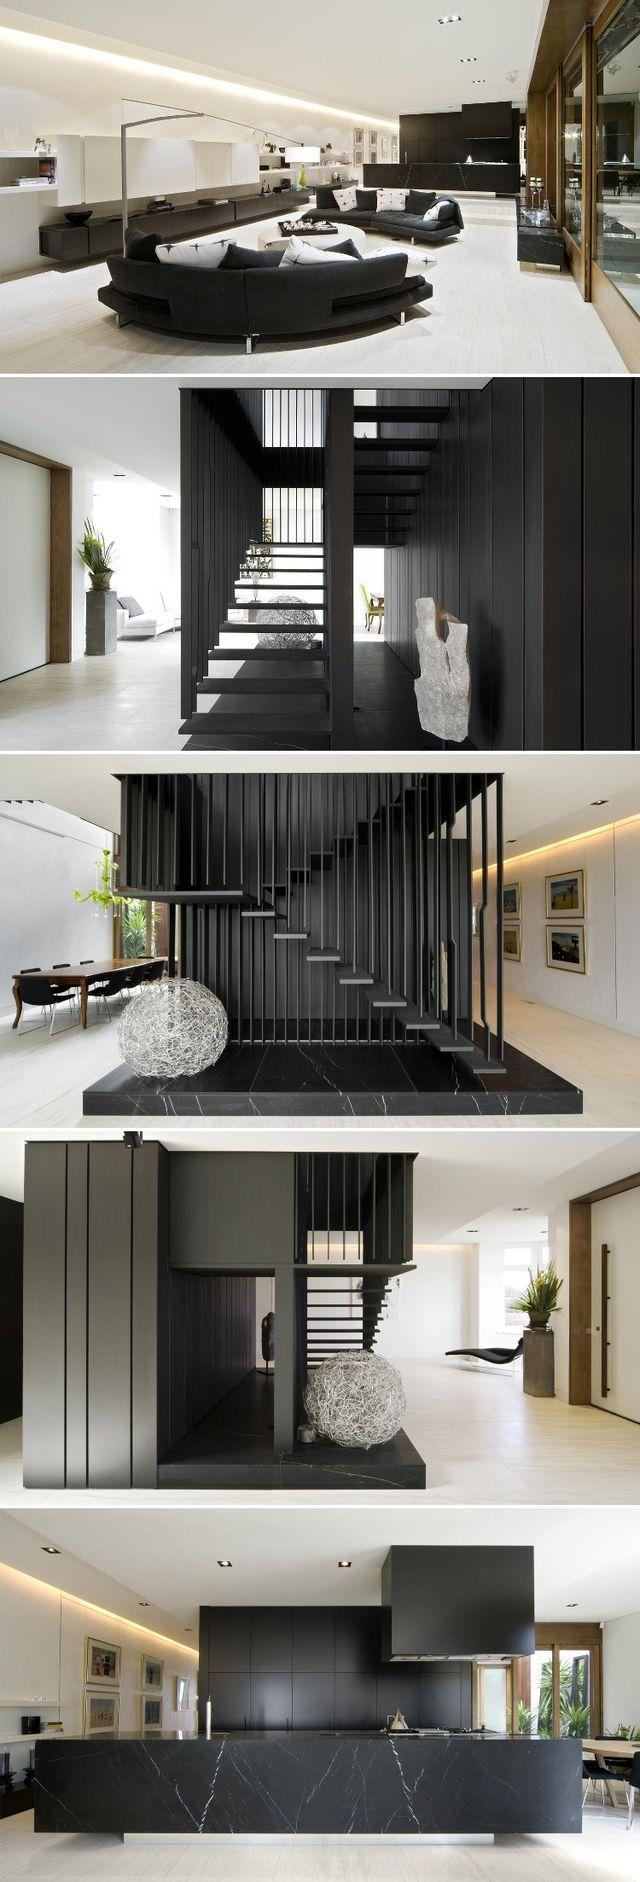 269 best interior design images on Pinterest | Restaurant interiors ...